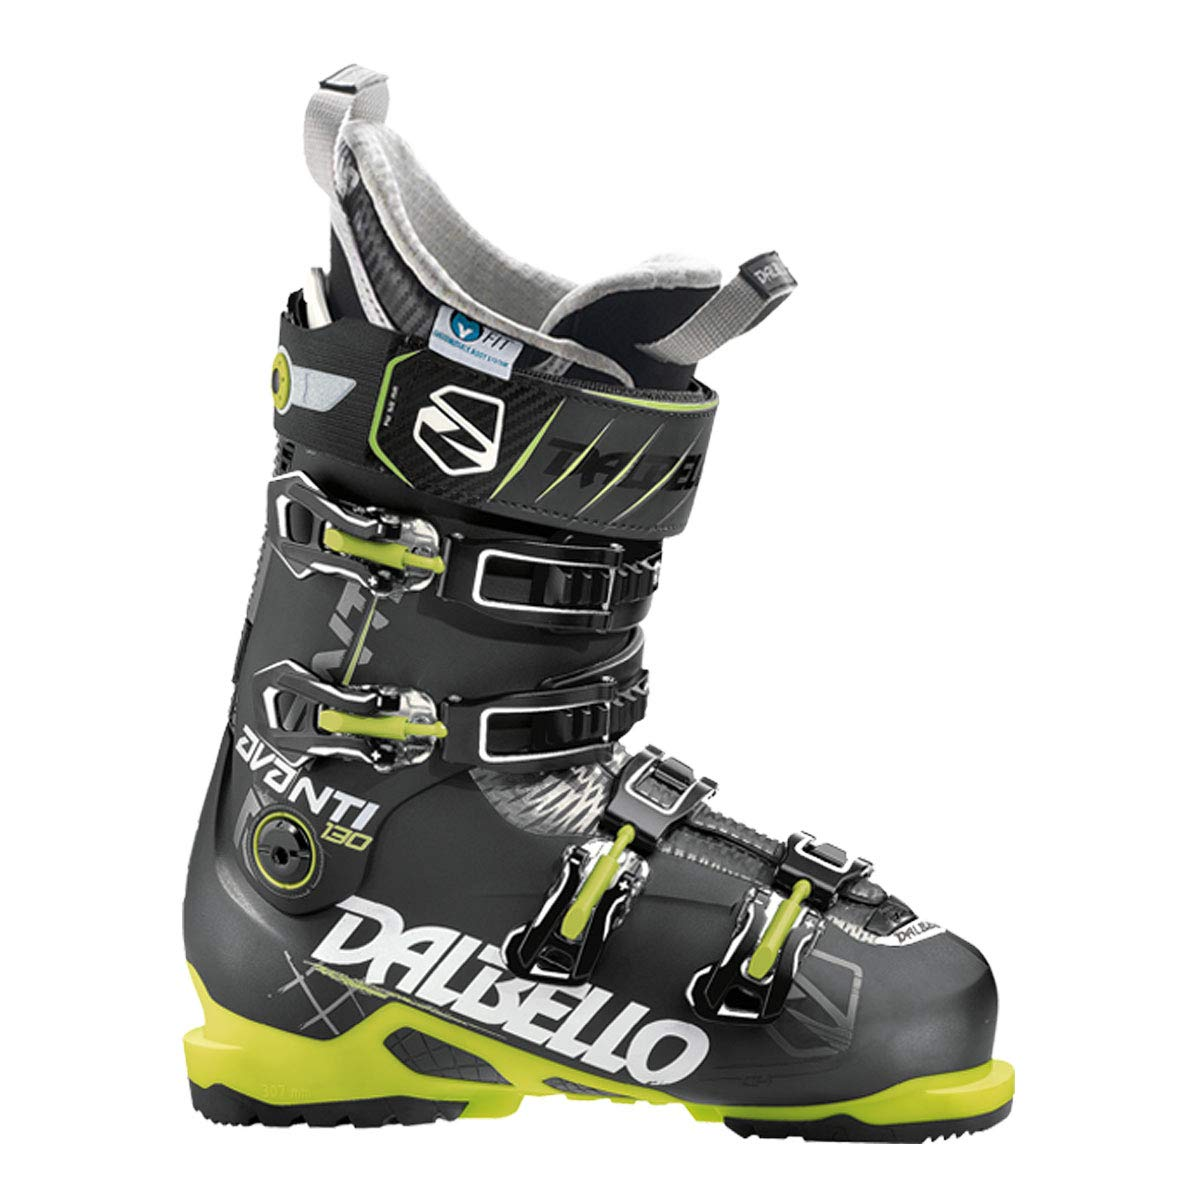 Dalbello Avanti 130 MS i.d. Ski Boot 2017